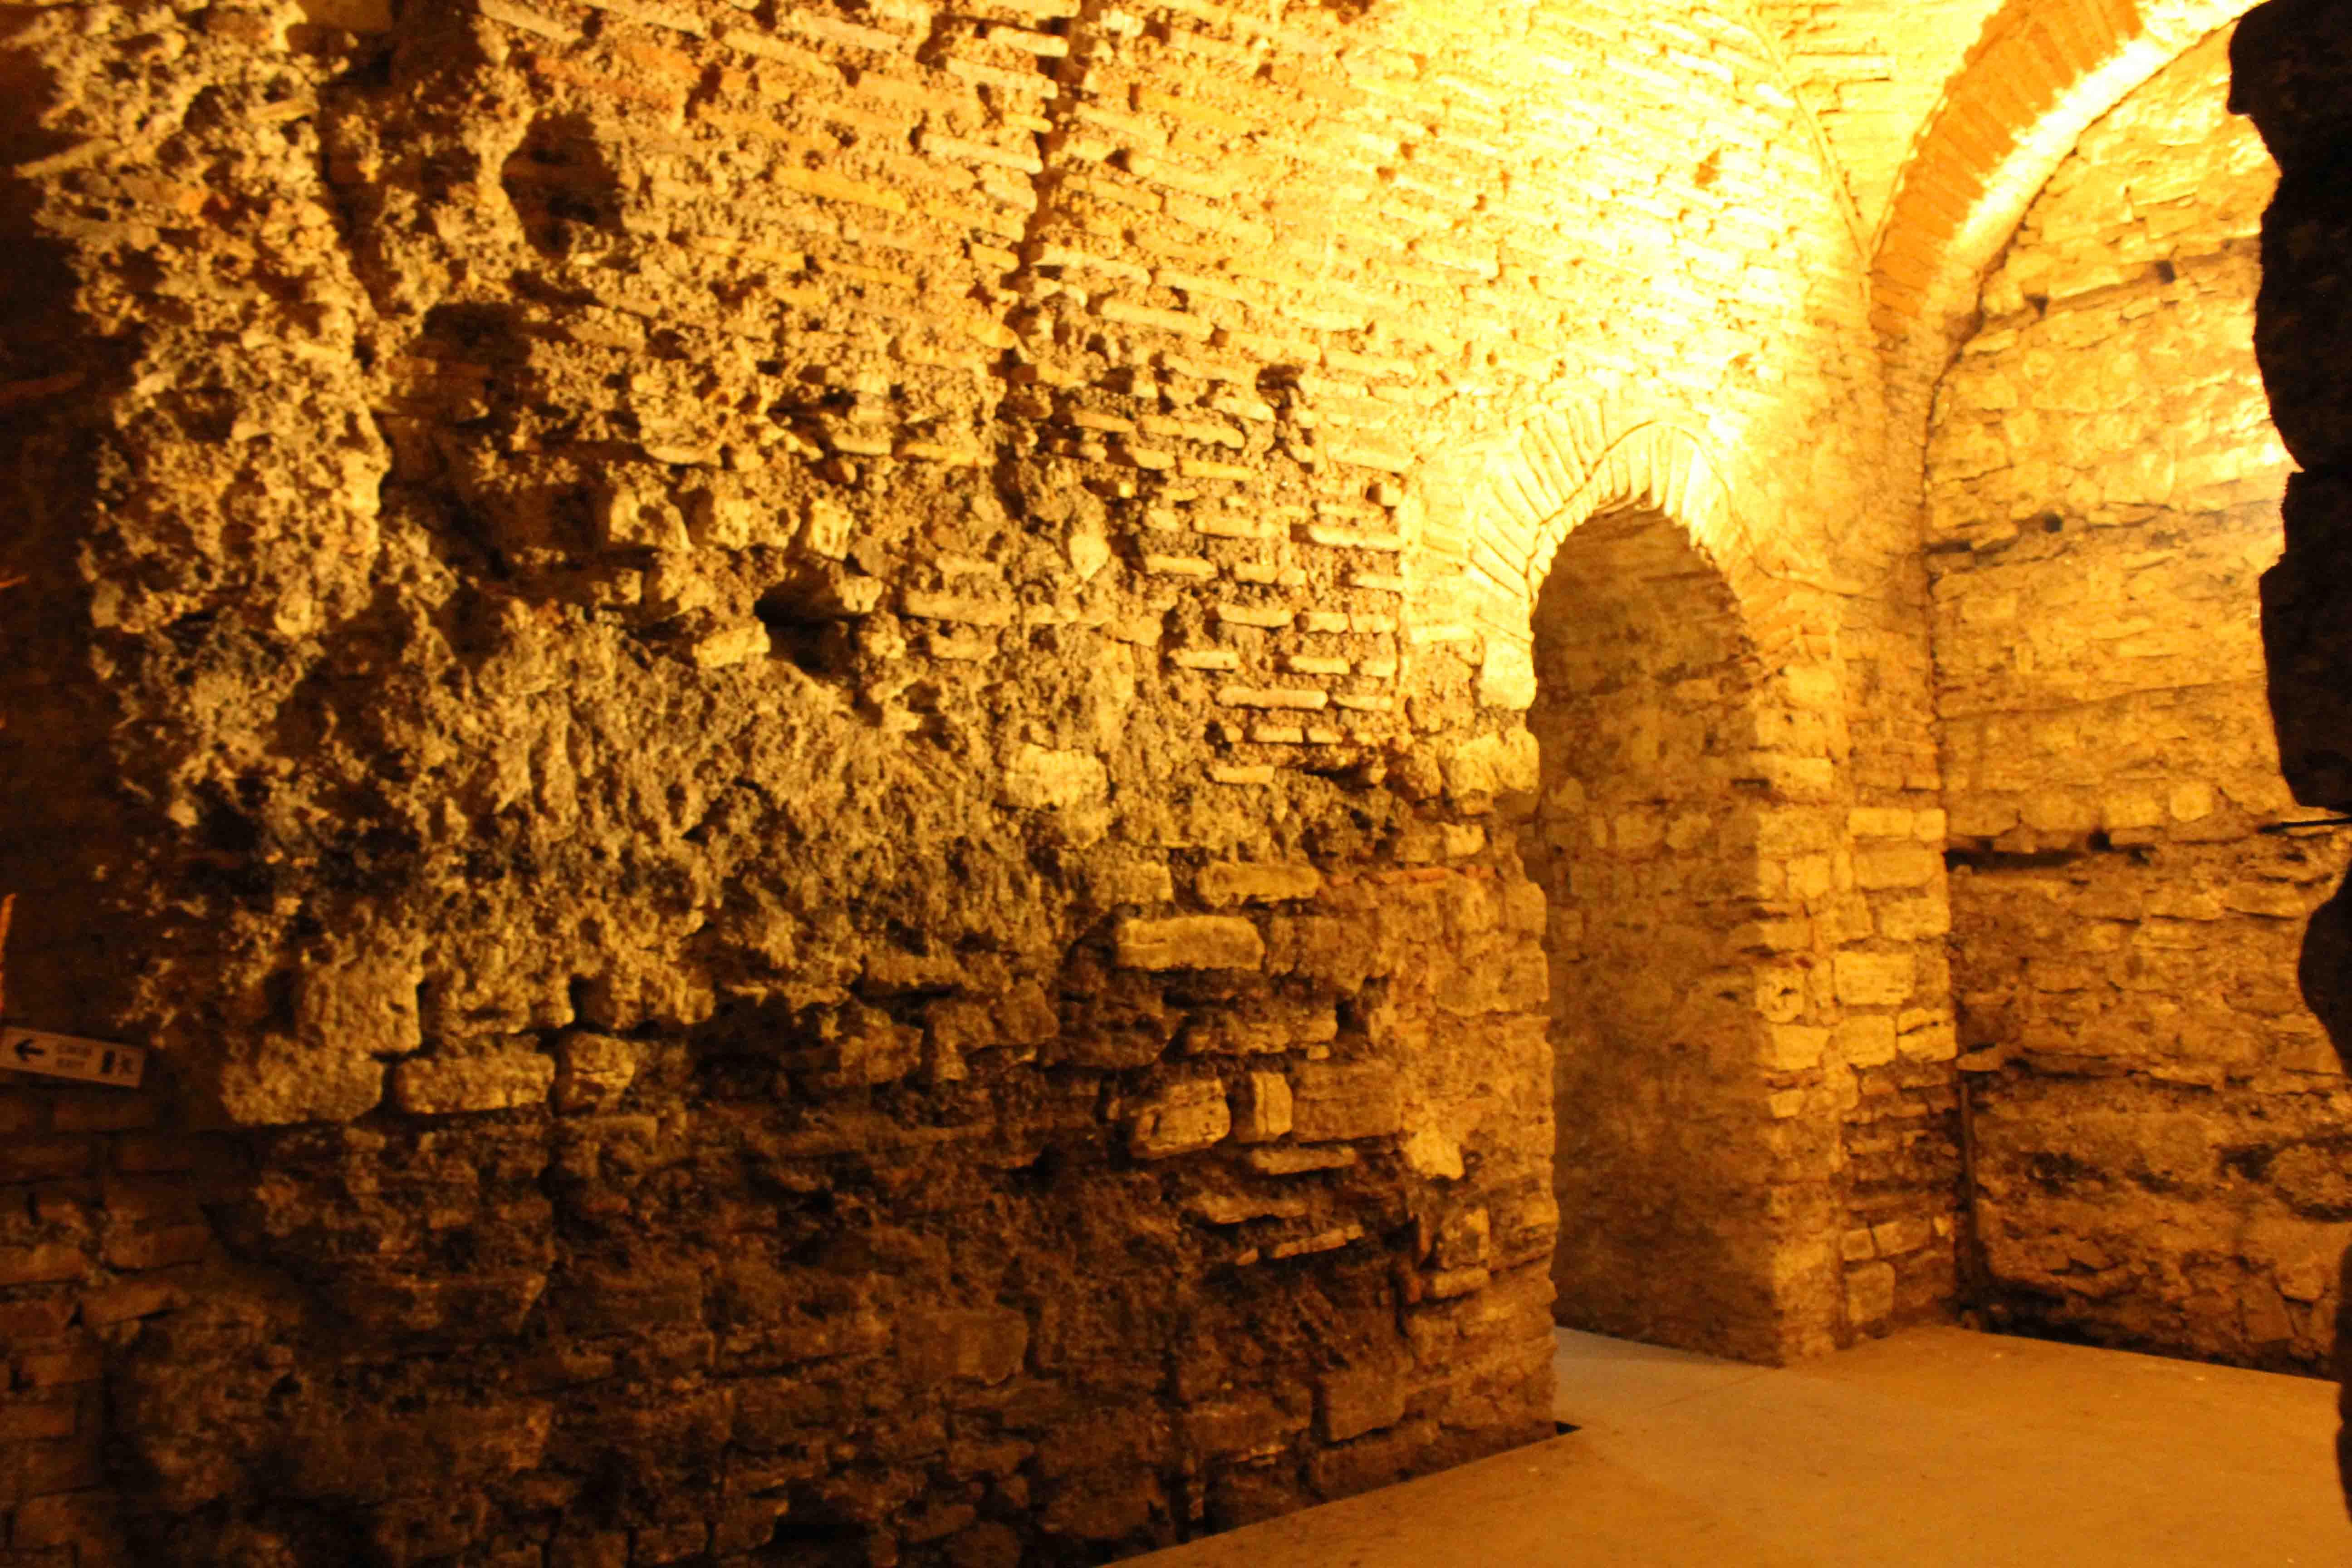 http://www.alburakathisma.com/images/galeri/orjinal/albura-Cistern-83.jpg